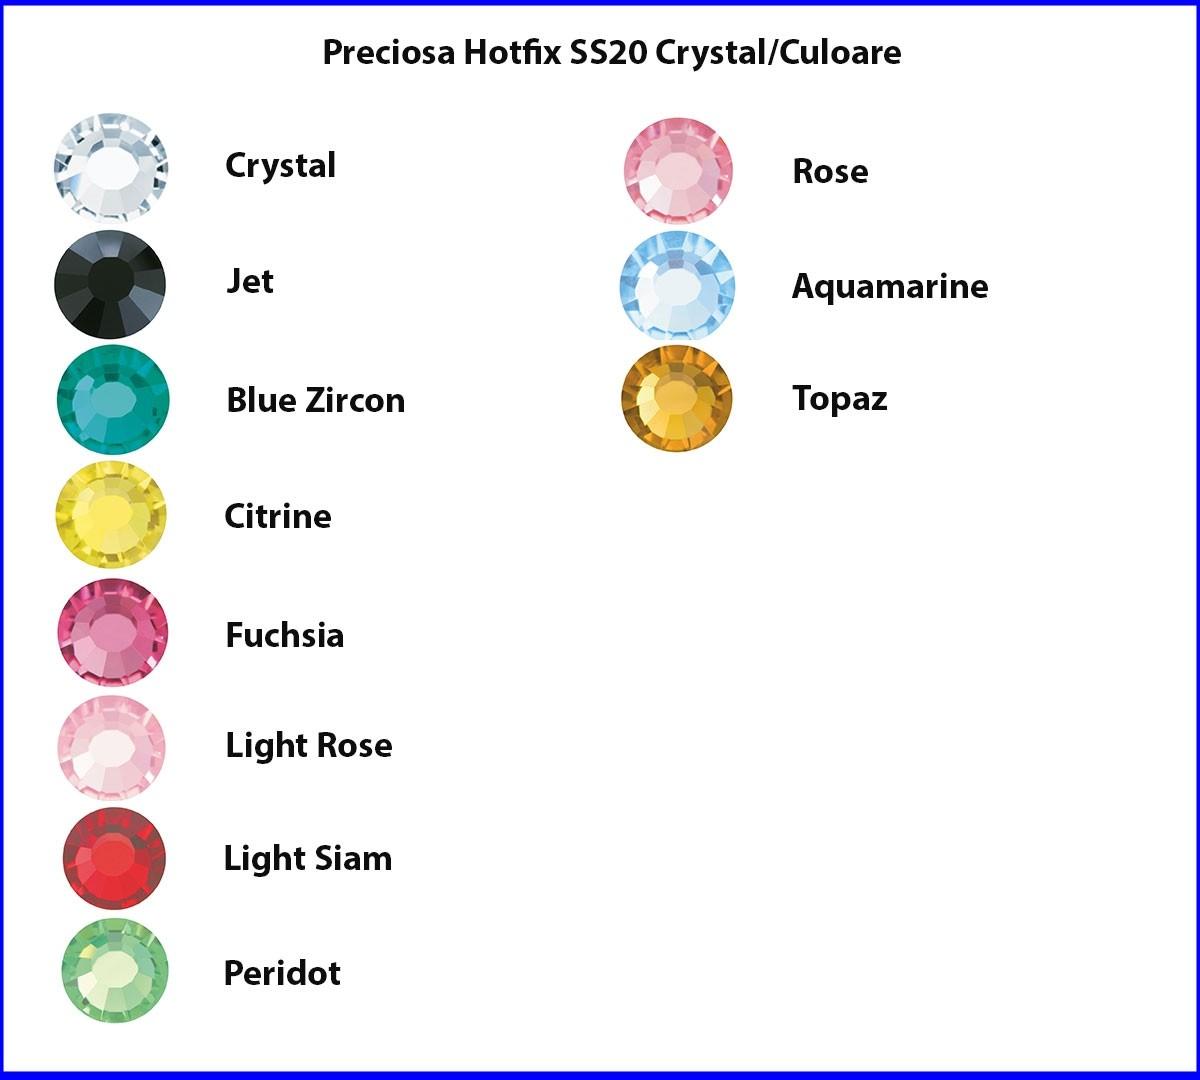 Preciosa Hotfix SS20 Culoare/Crystal